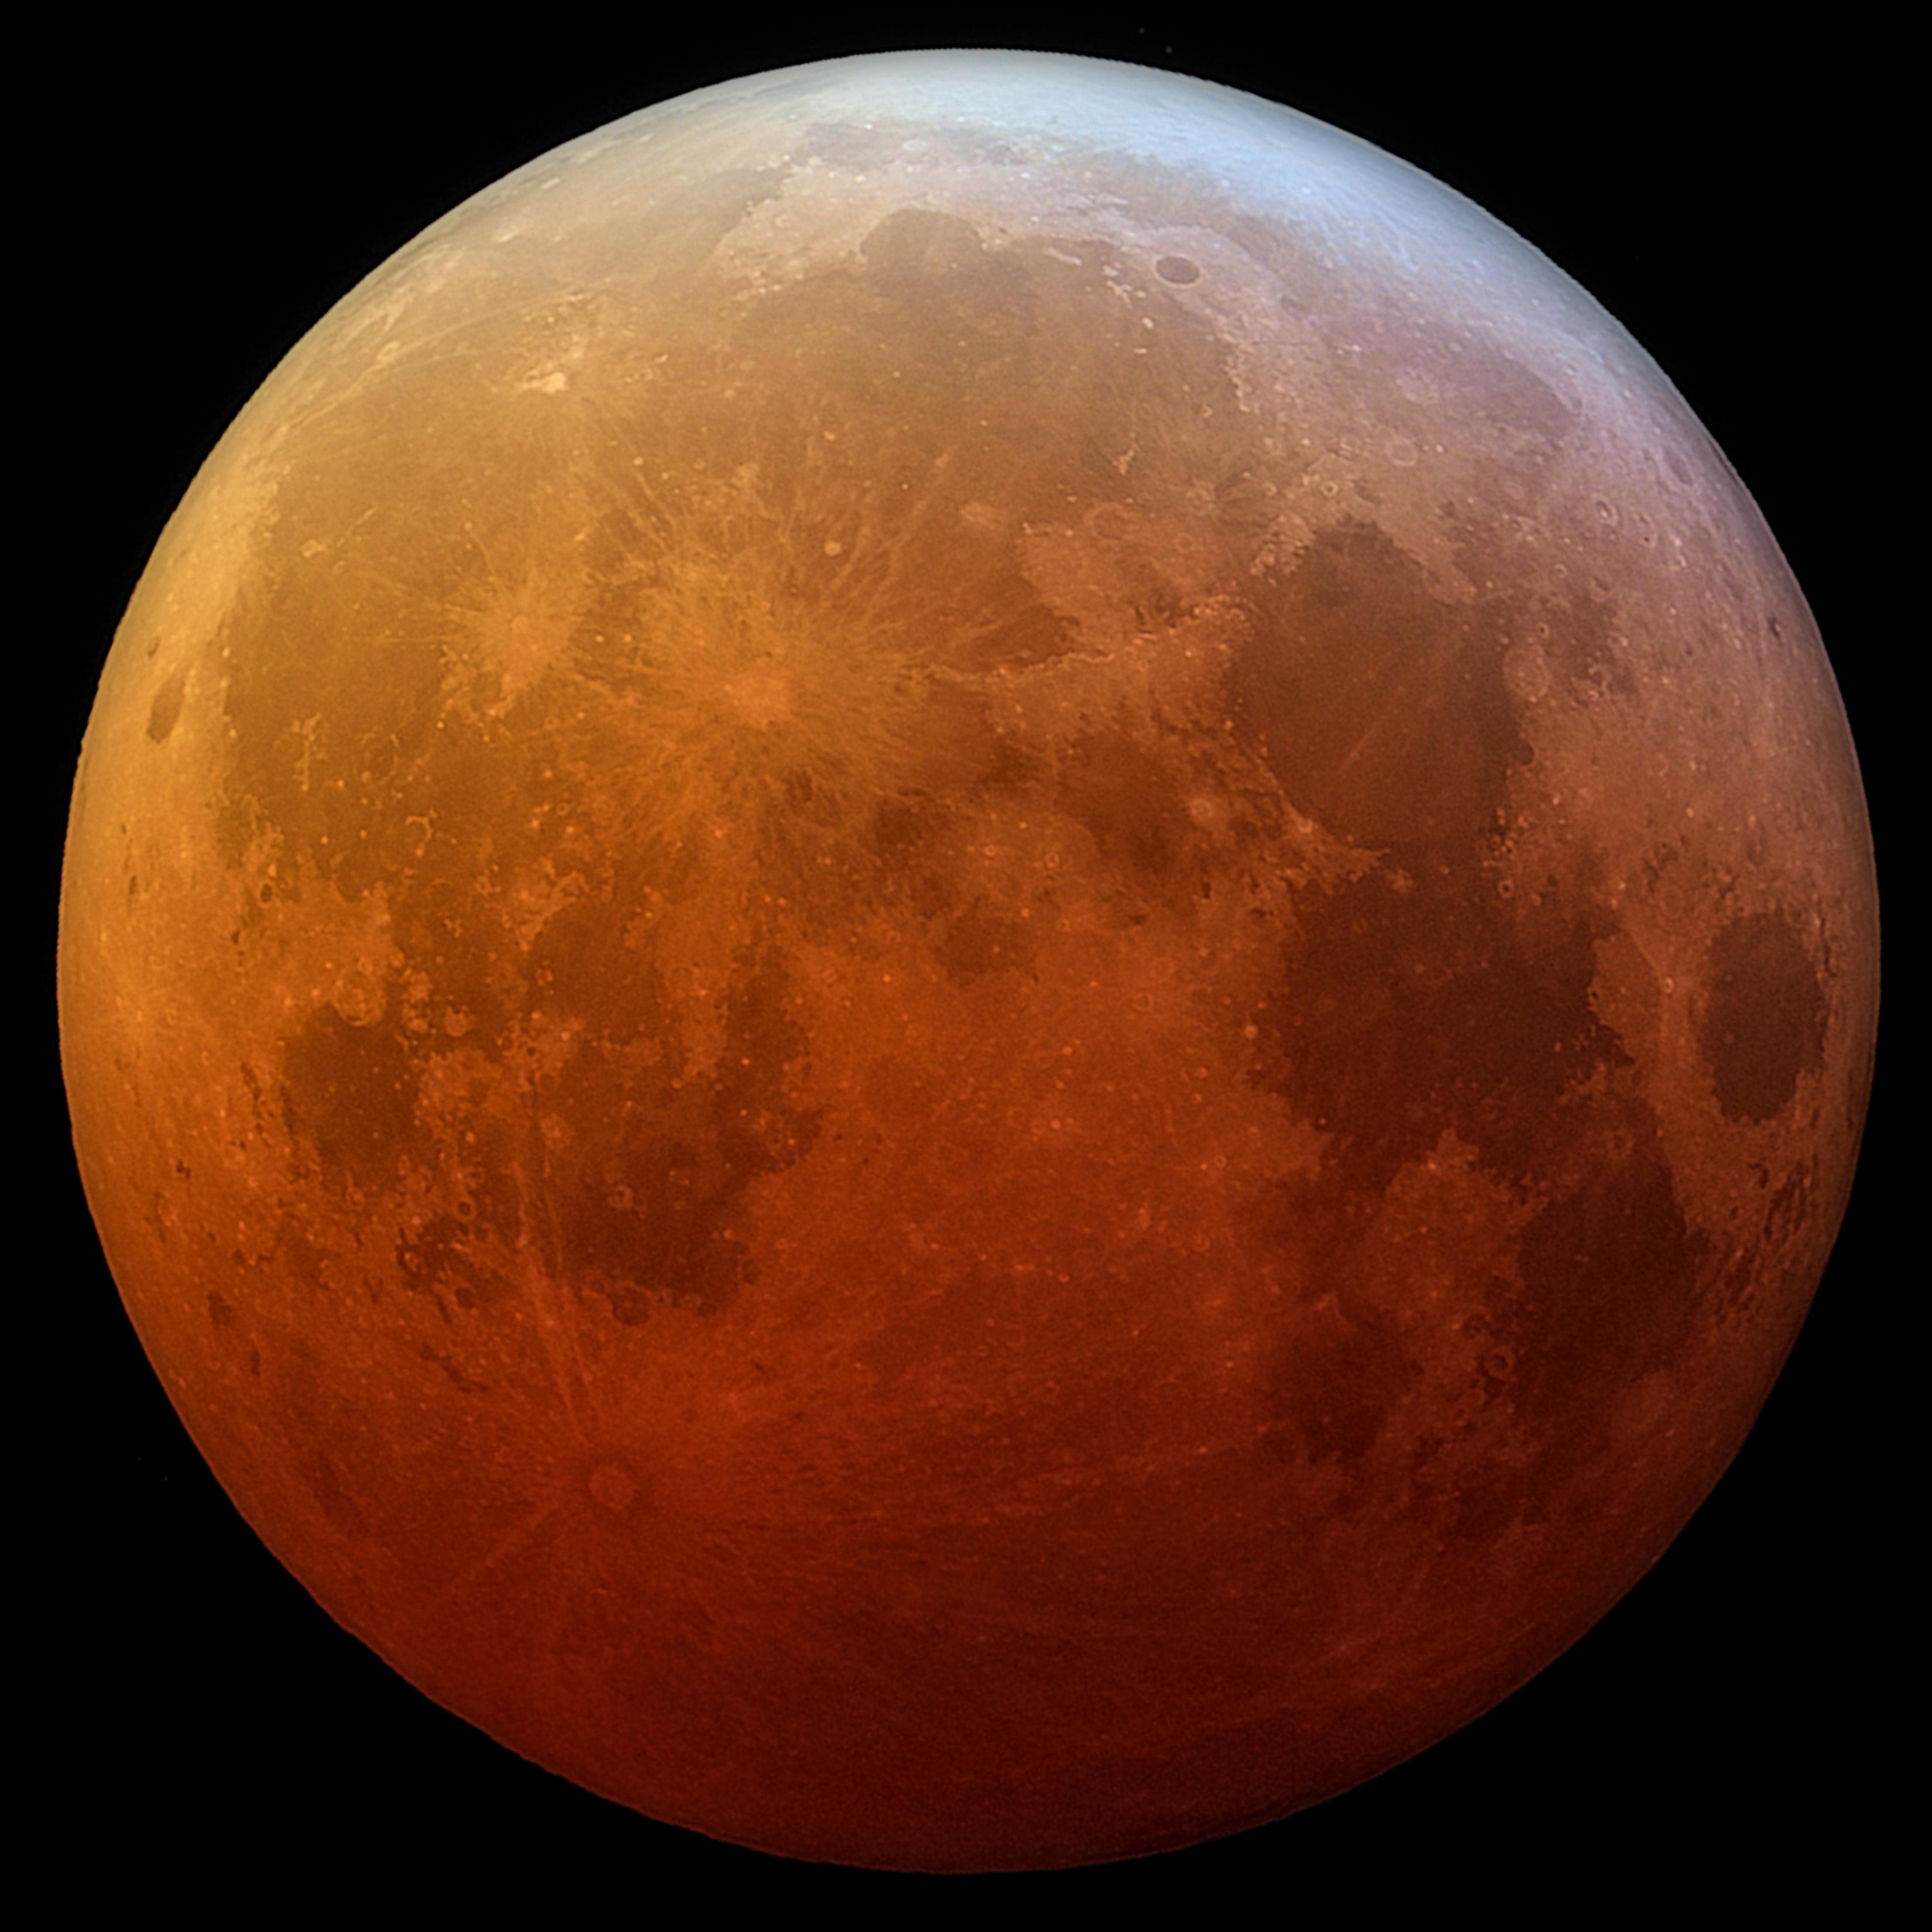 January 2019 lunar eclipse - Wikipedia